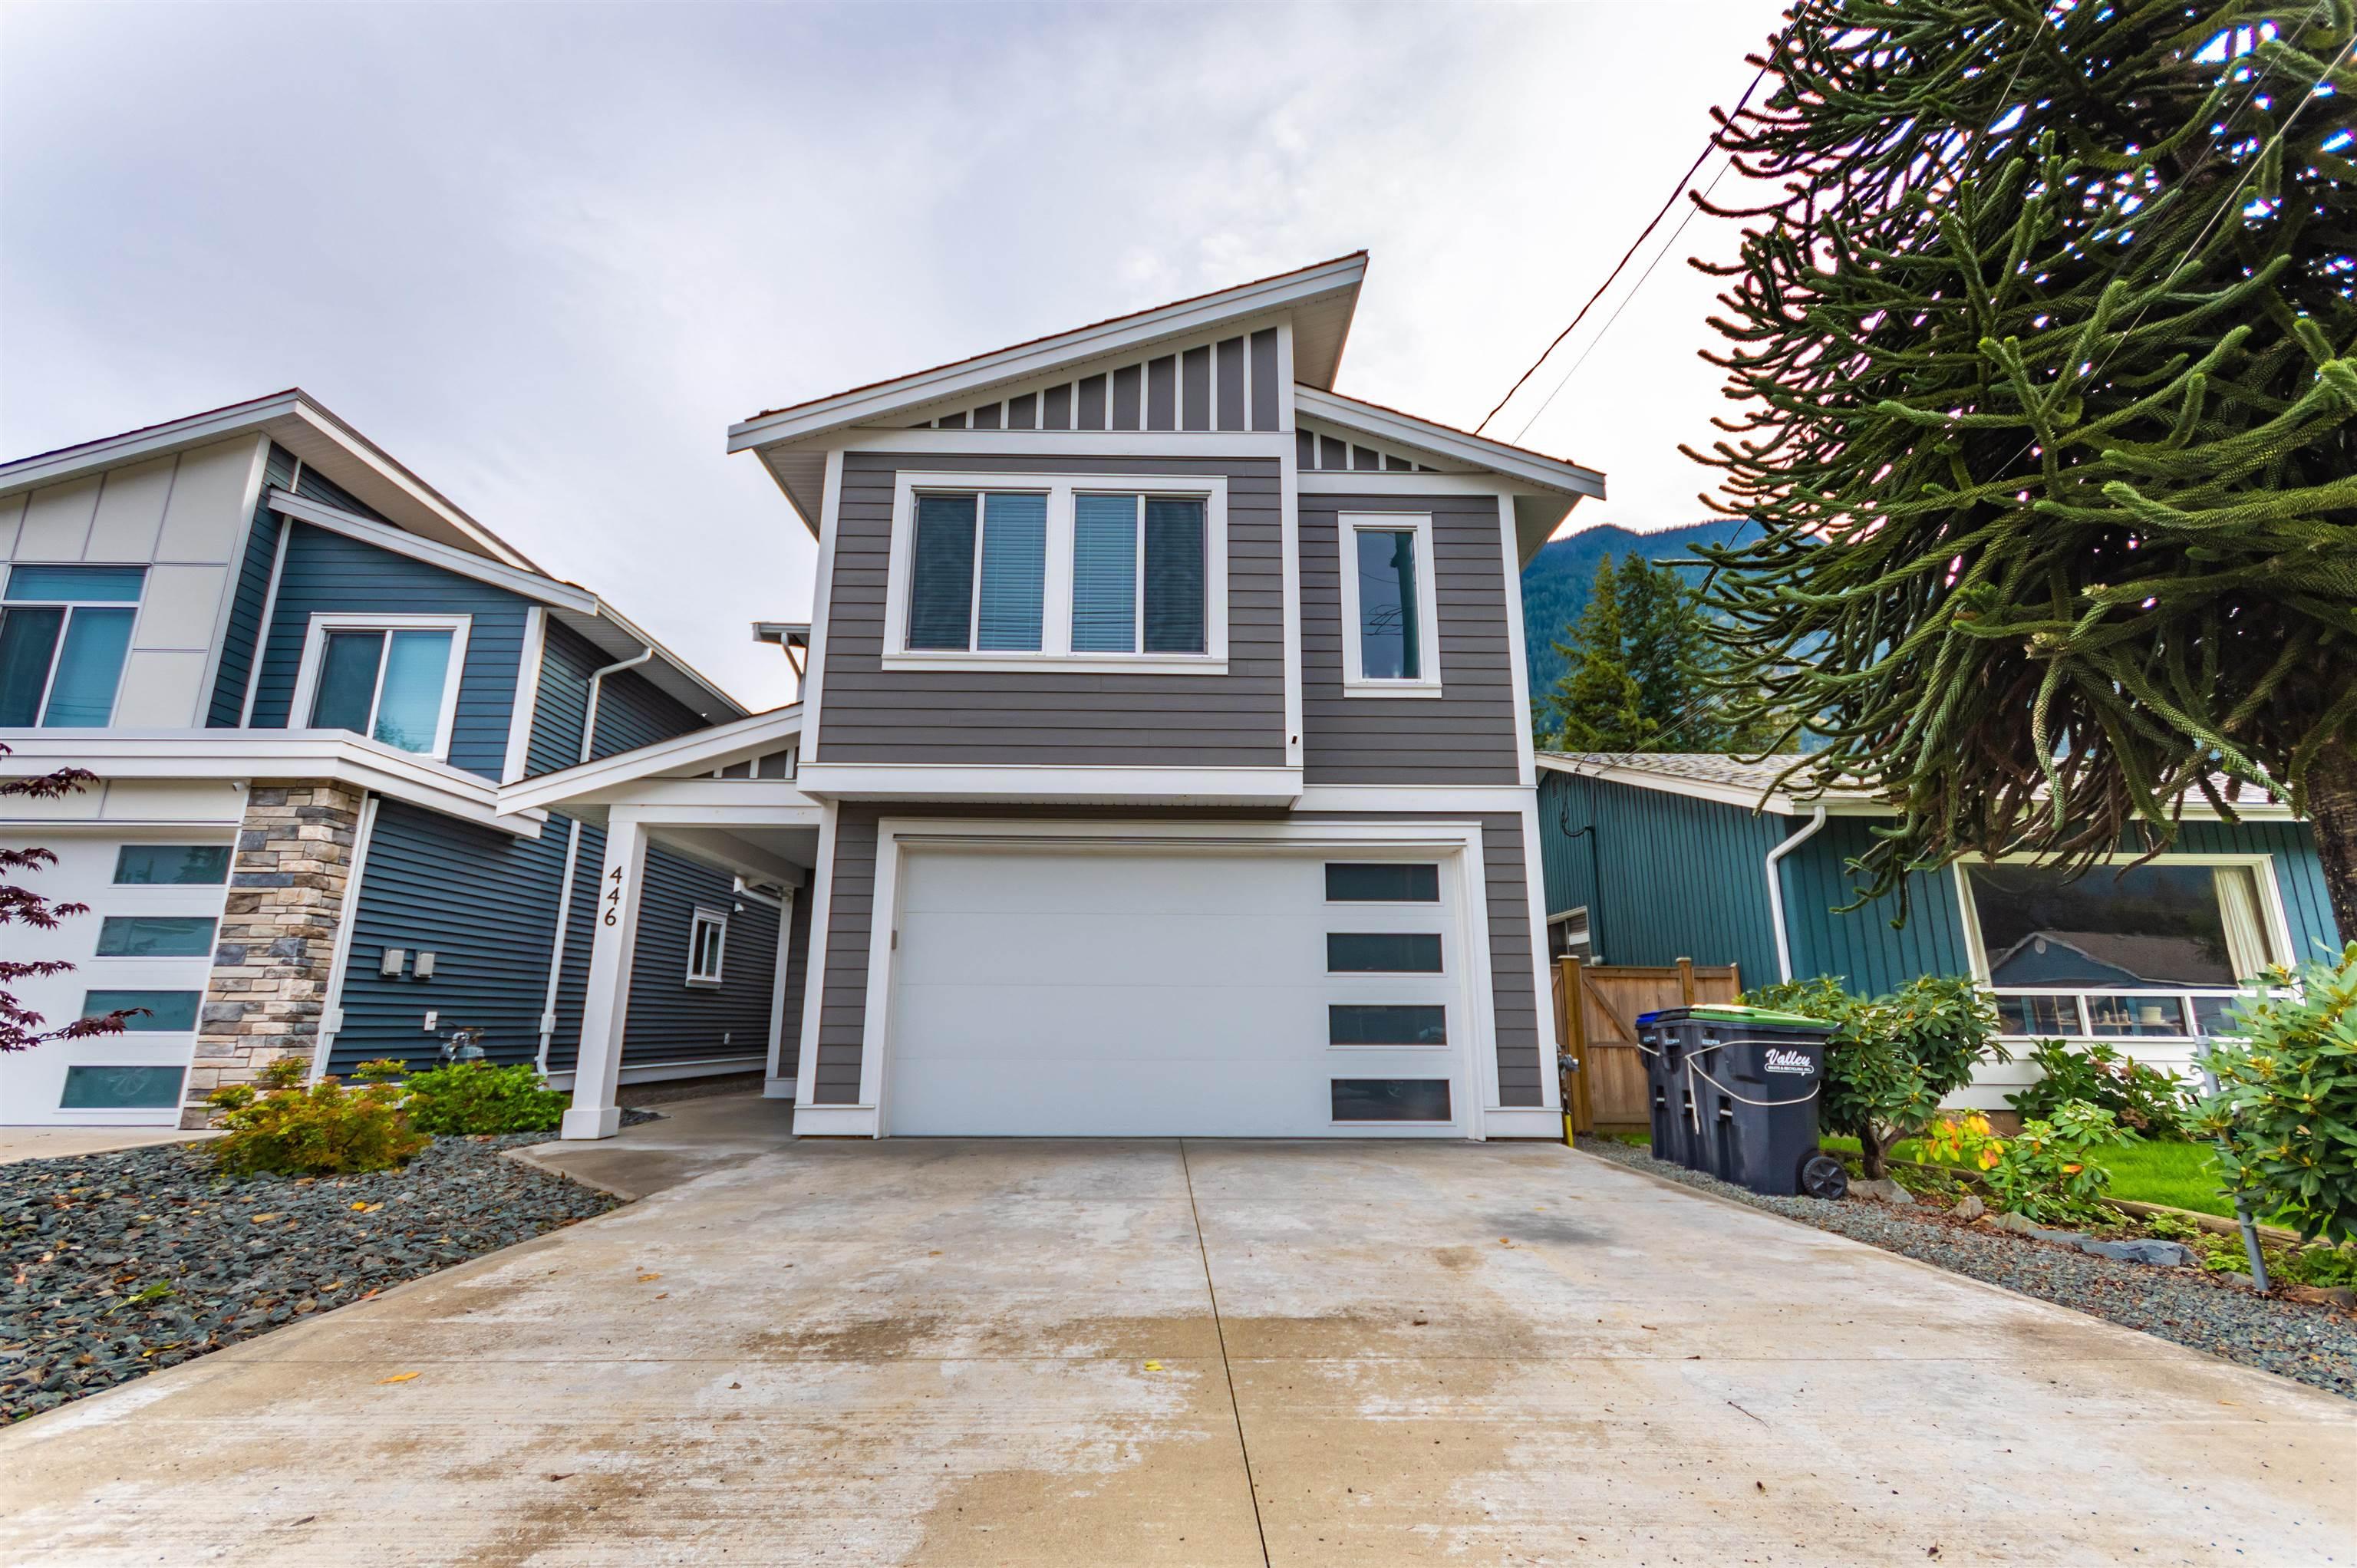 446 FORT STREET - Hope Center House/Single Family for sale, 4 Bedrooms (R2626287) - #1